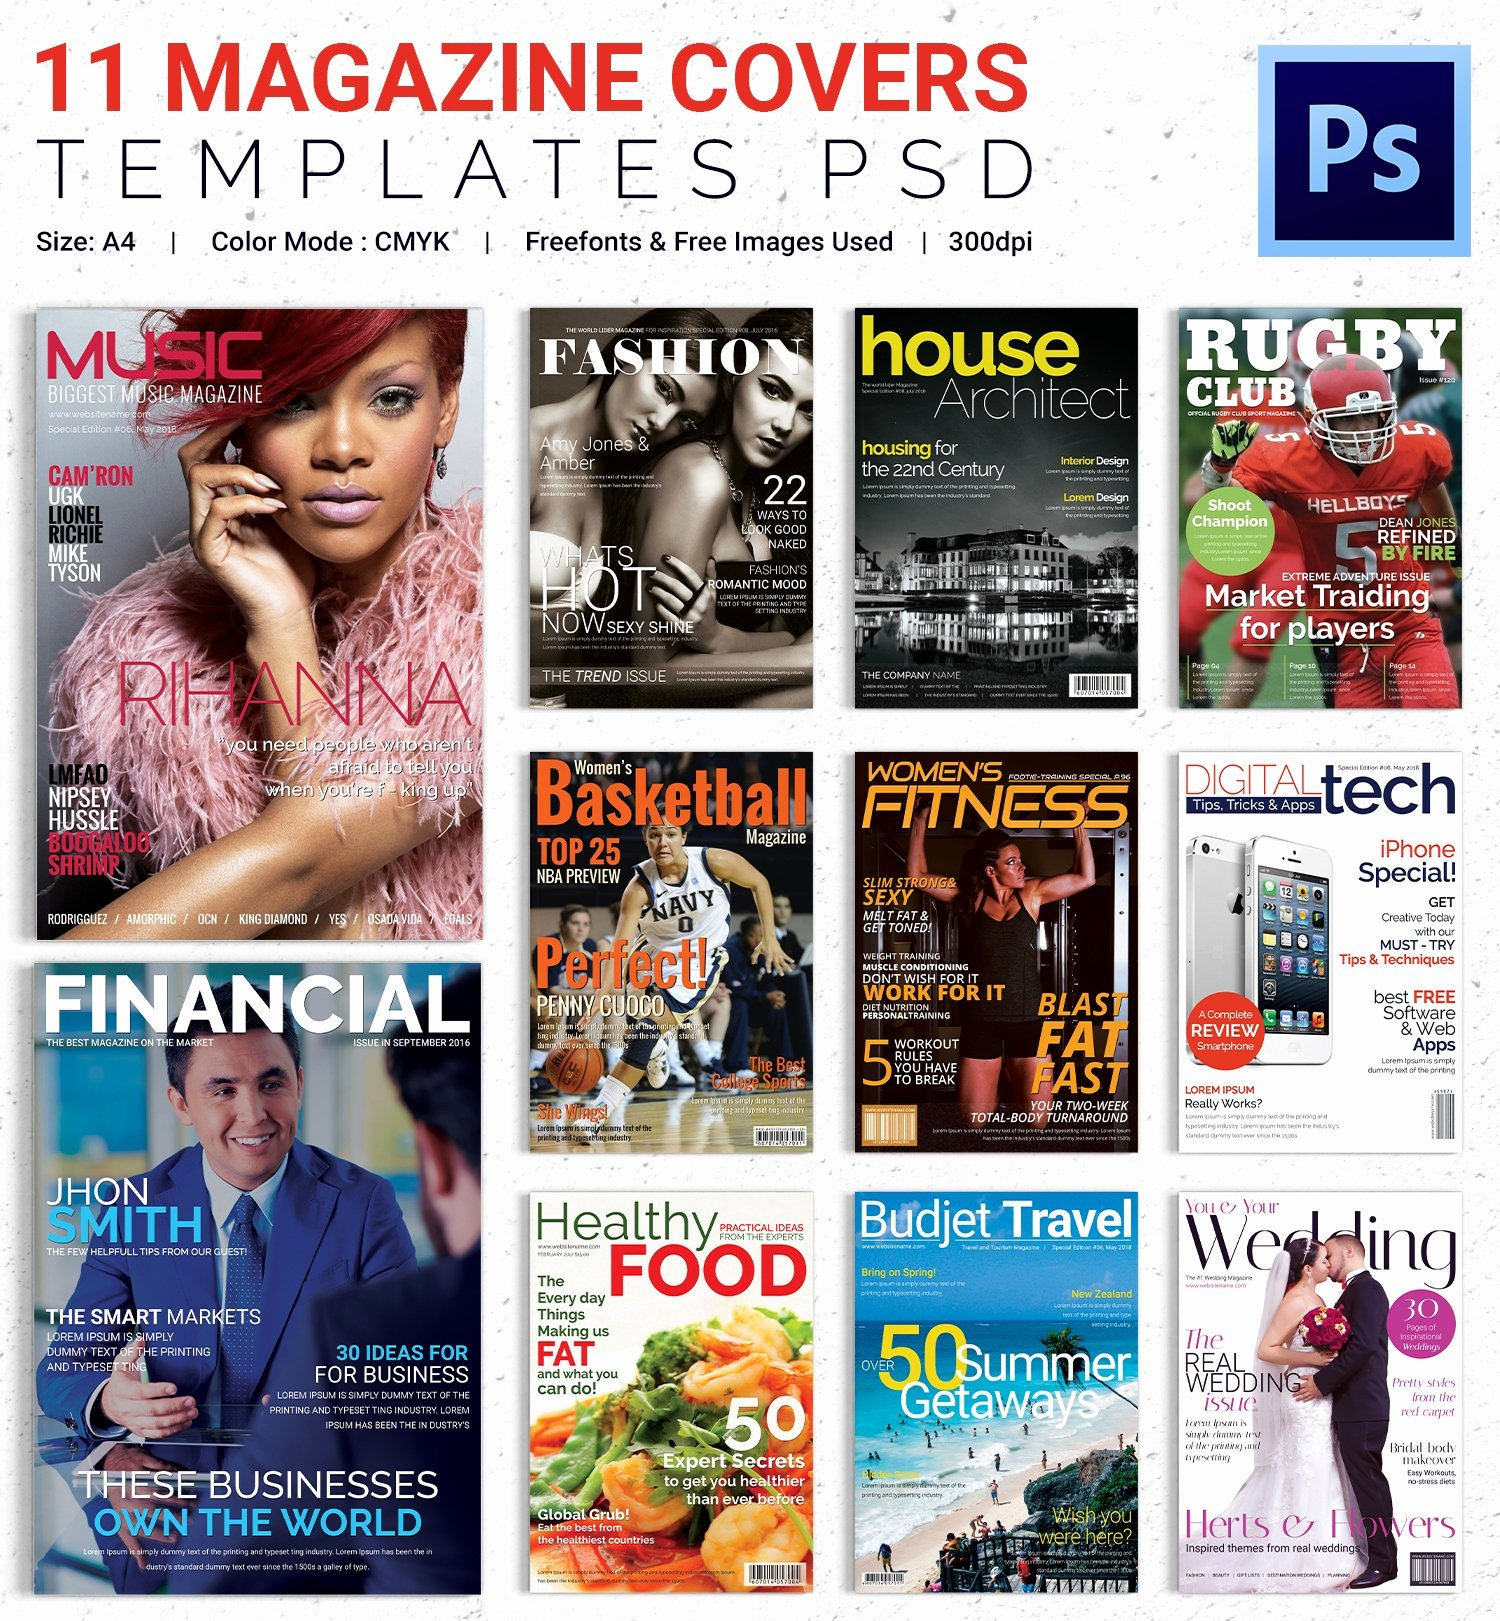 Magazine Cover Templates Psd Elegant Magazine Cover Psd Template – 31 Free Psd Ai Vector Eps